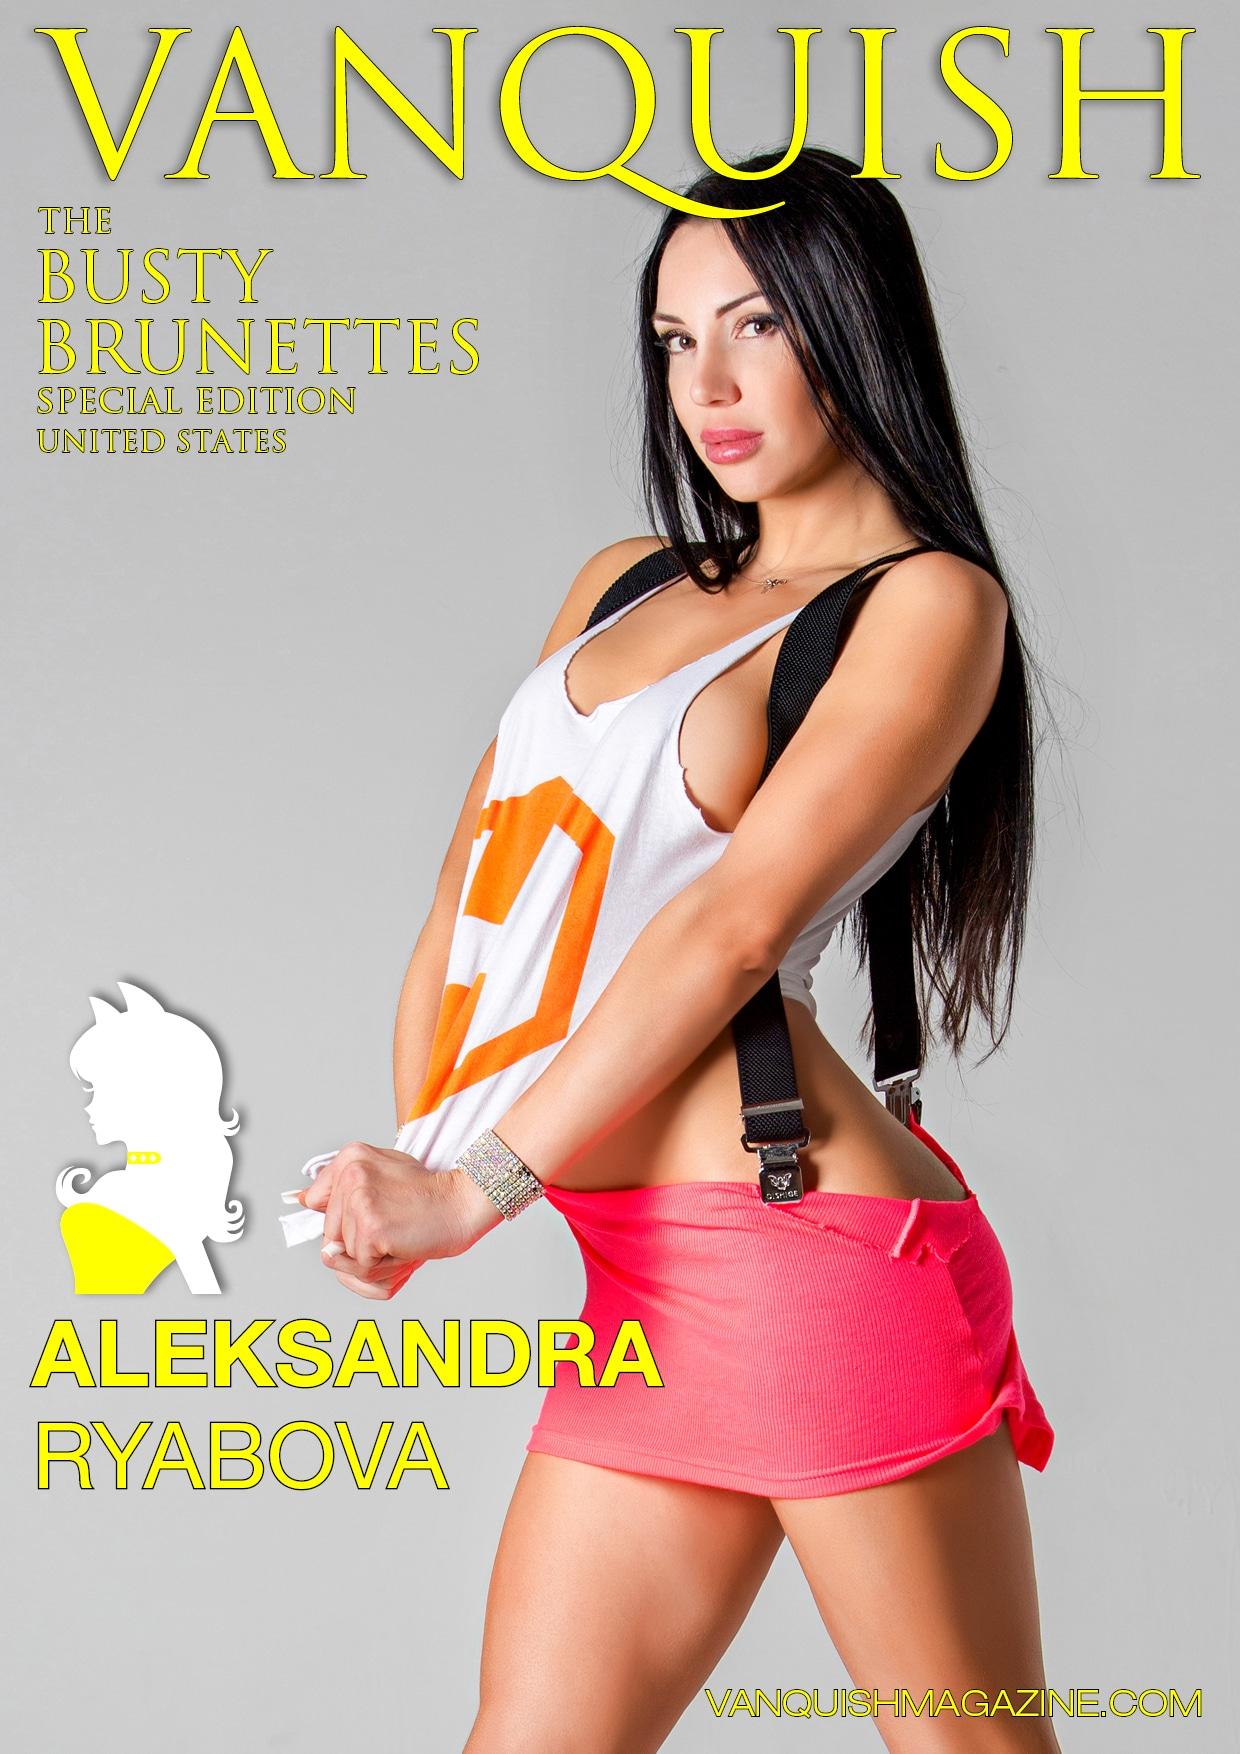 Vanquish Magazine - April 2020 - Busty Brunettes - Aleksandra Ryabova